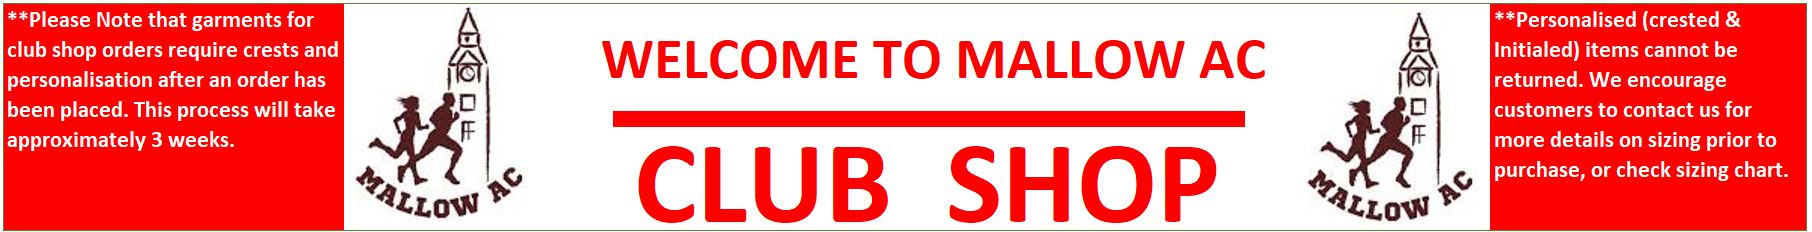 Mallow Athletic Club